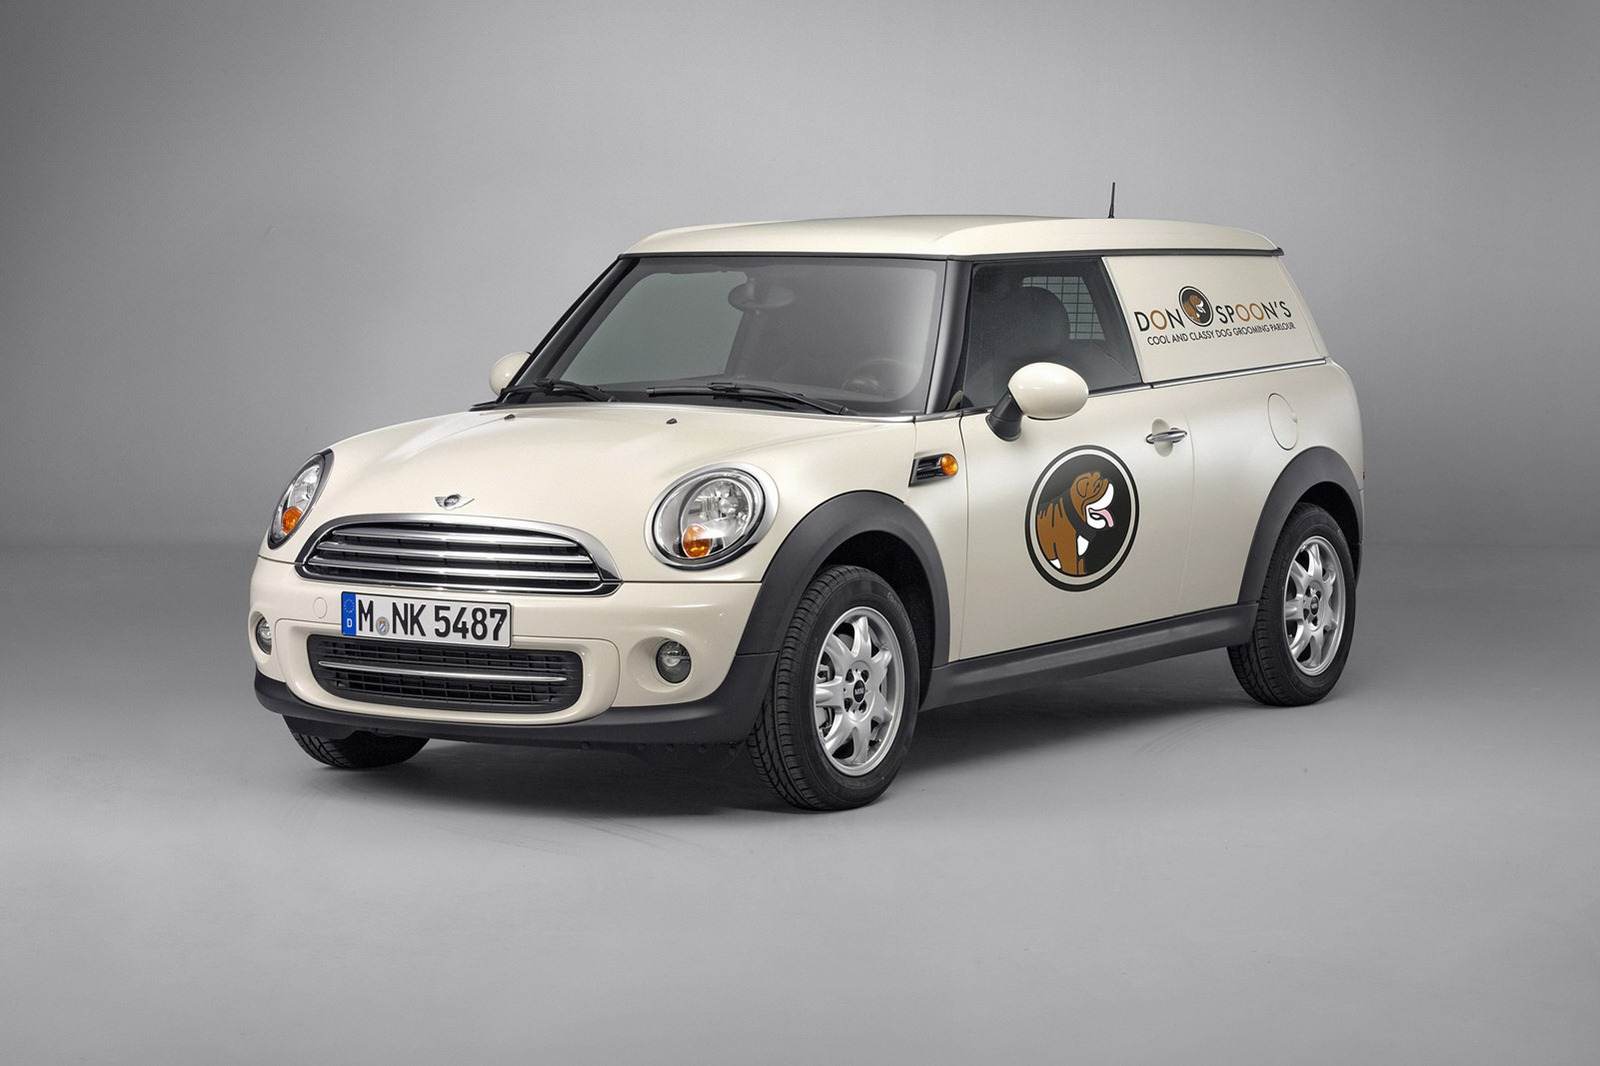 2013-Mini-Clubvan-Production-Model-2.jpg?imgmax=1800